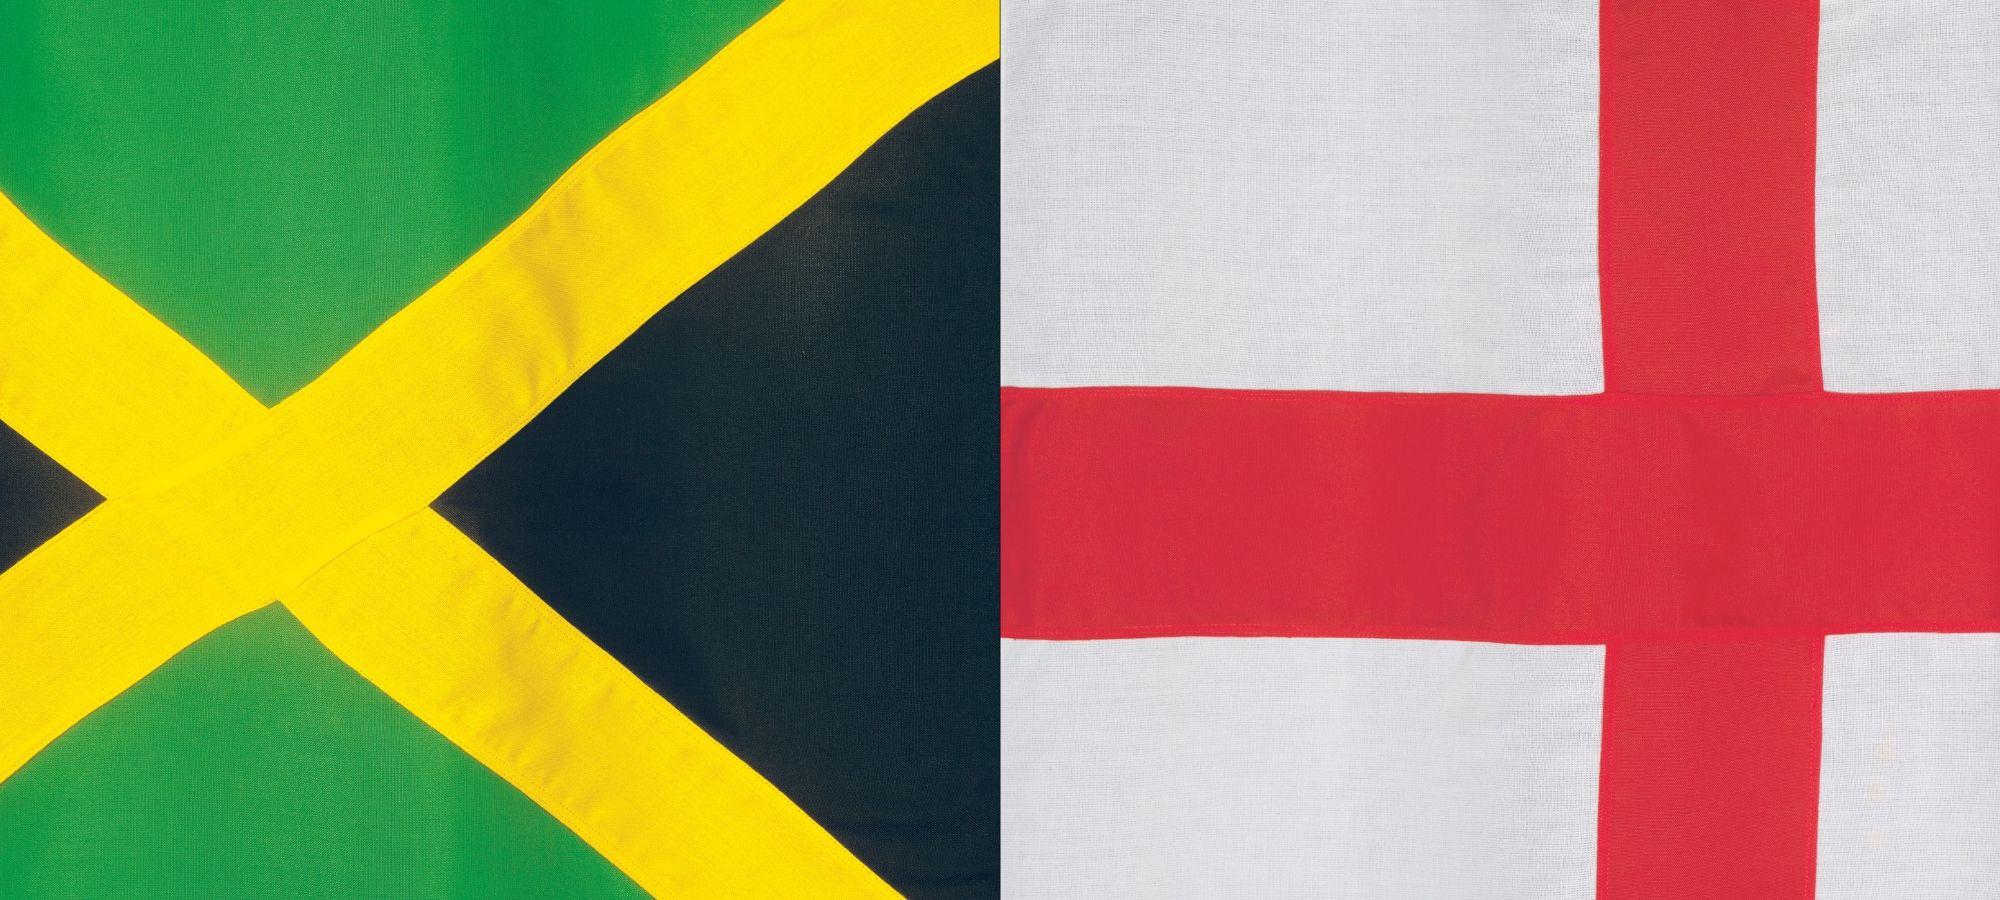 Wahala Comedy Clash: Jamaica vs England 2019 — Page Banner